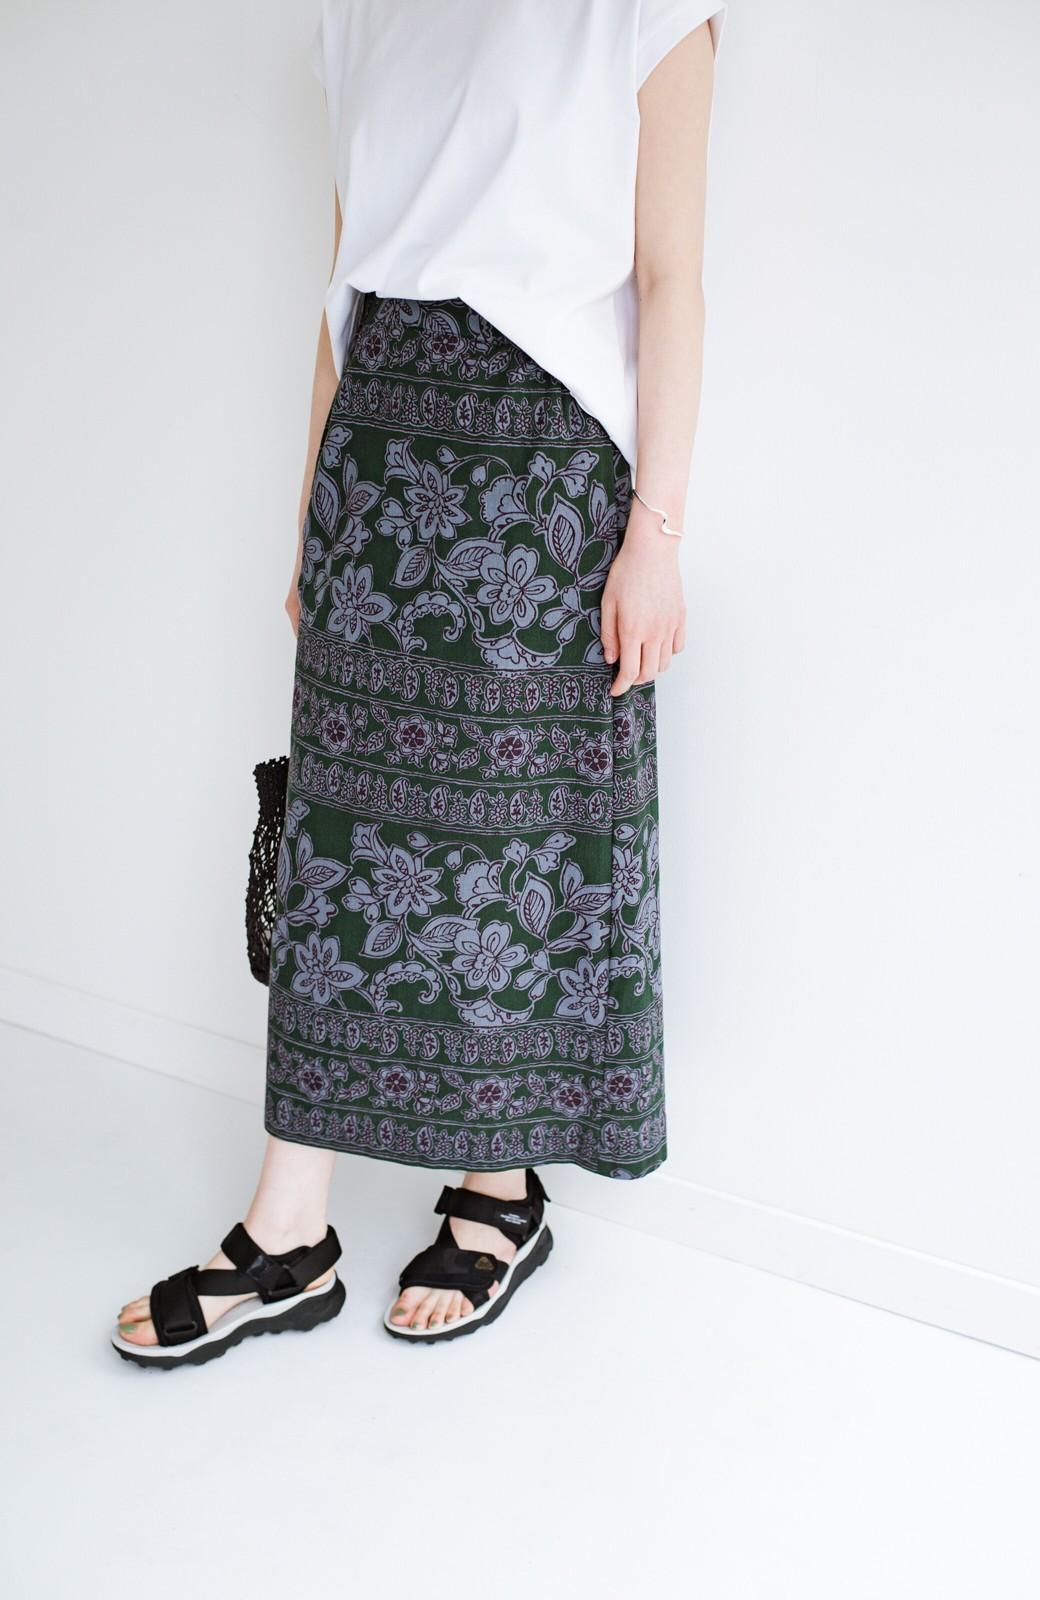 haco! 京都の浴衣屋さんと作った浴衣生地のセミタイトスカート <グリーン系その他>の商品写真12